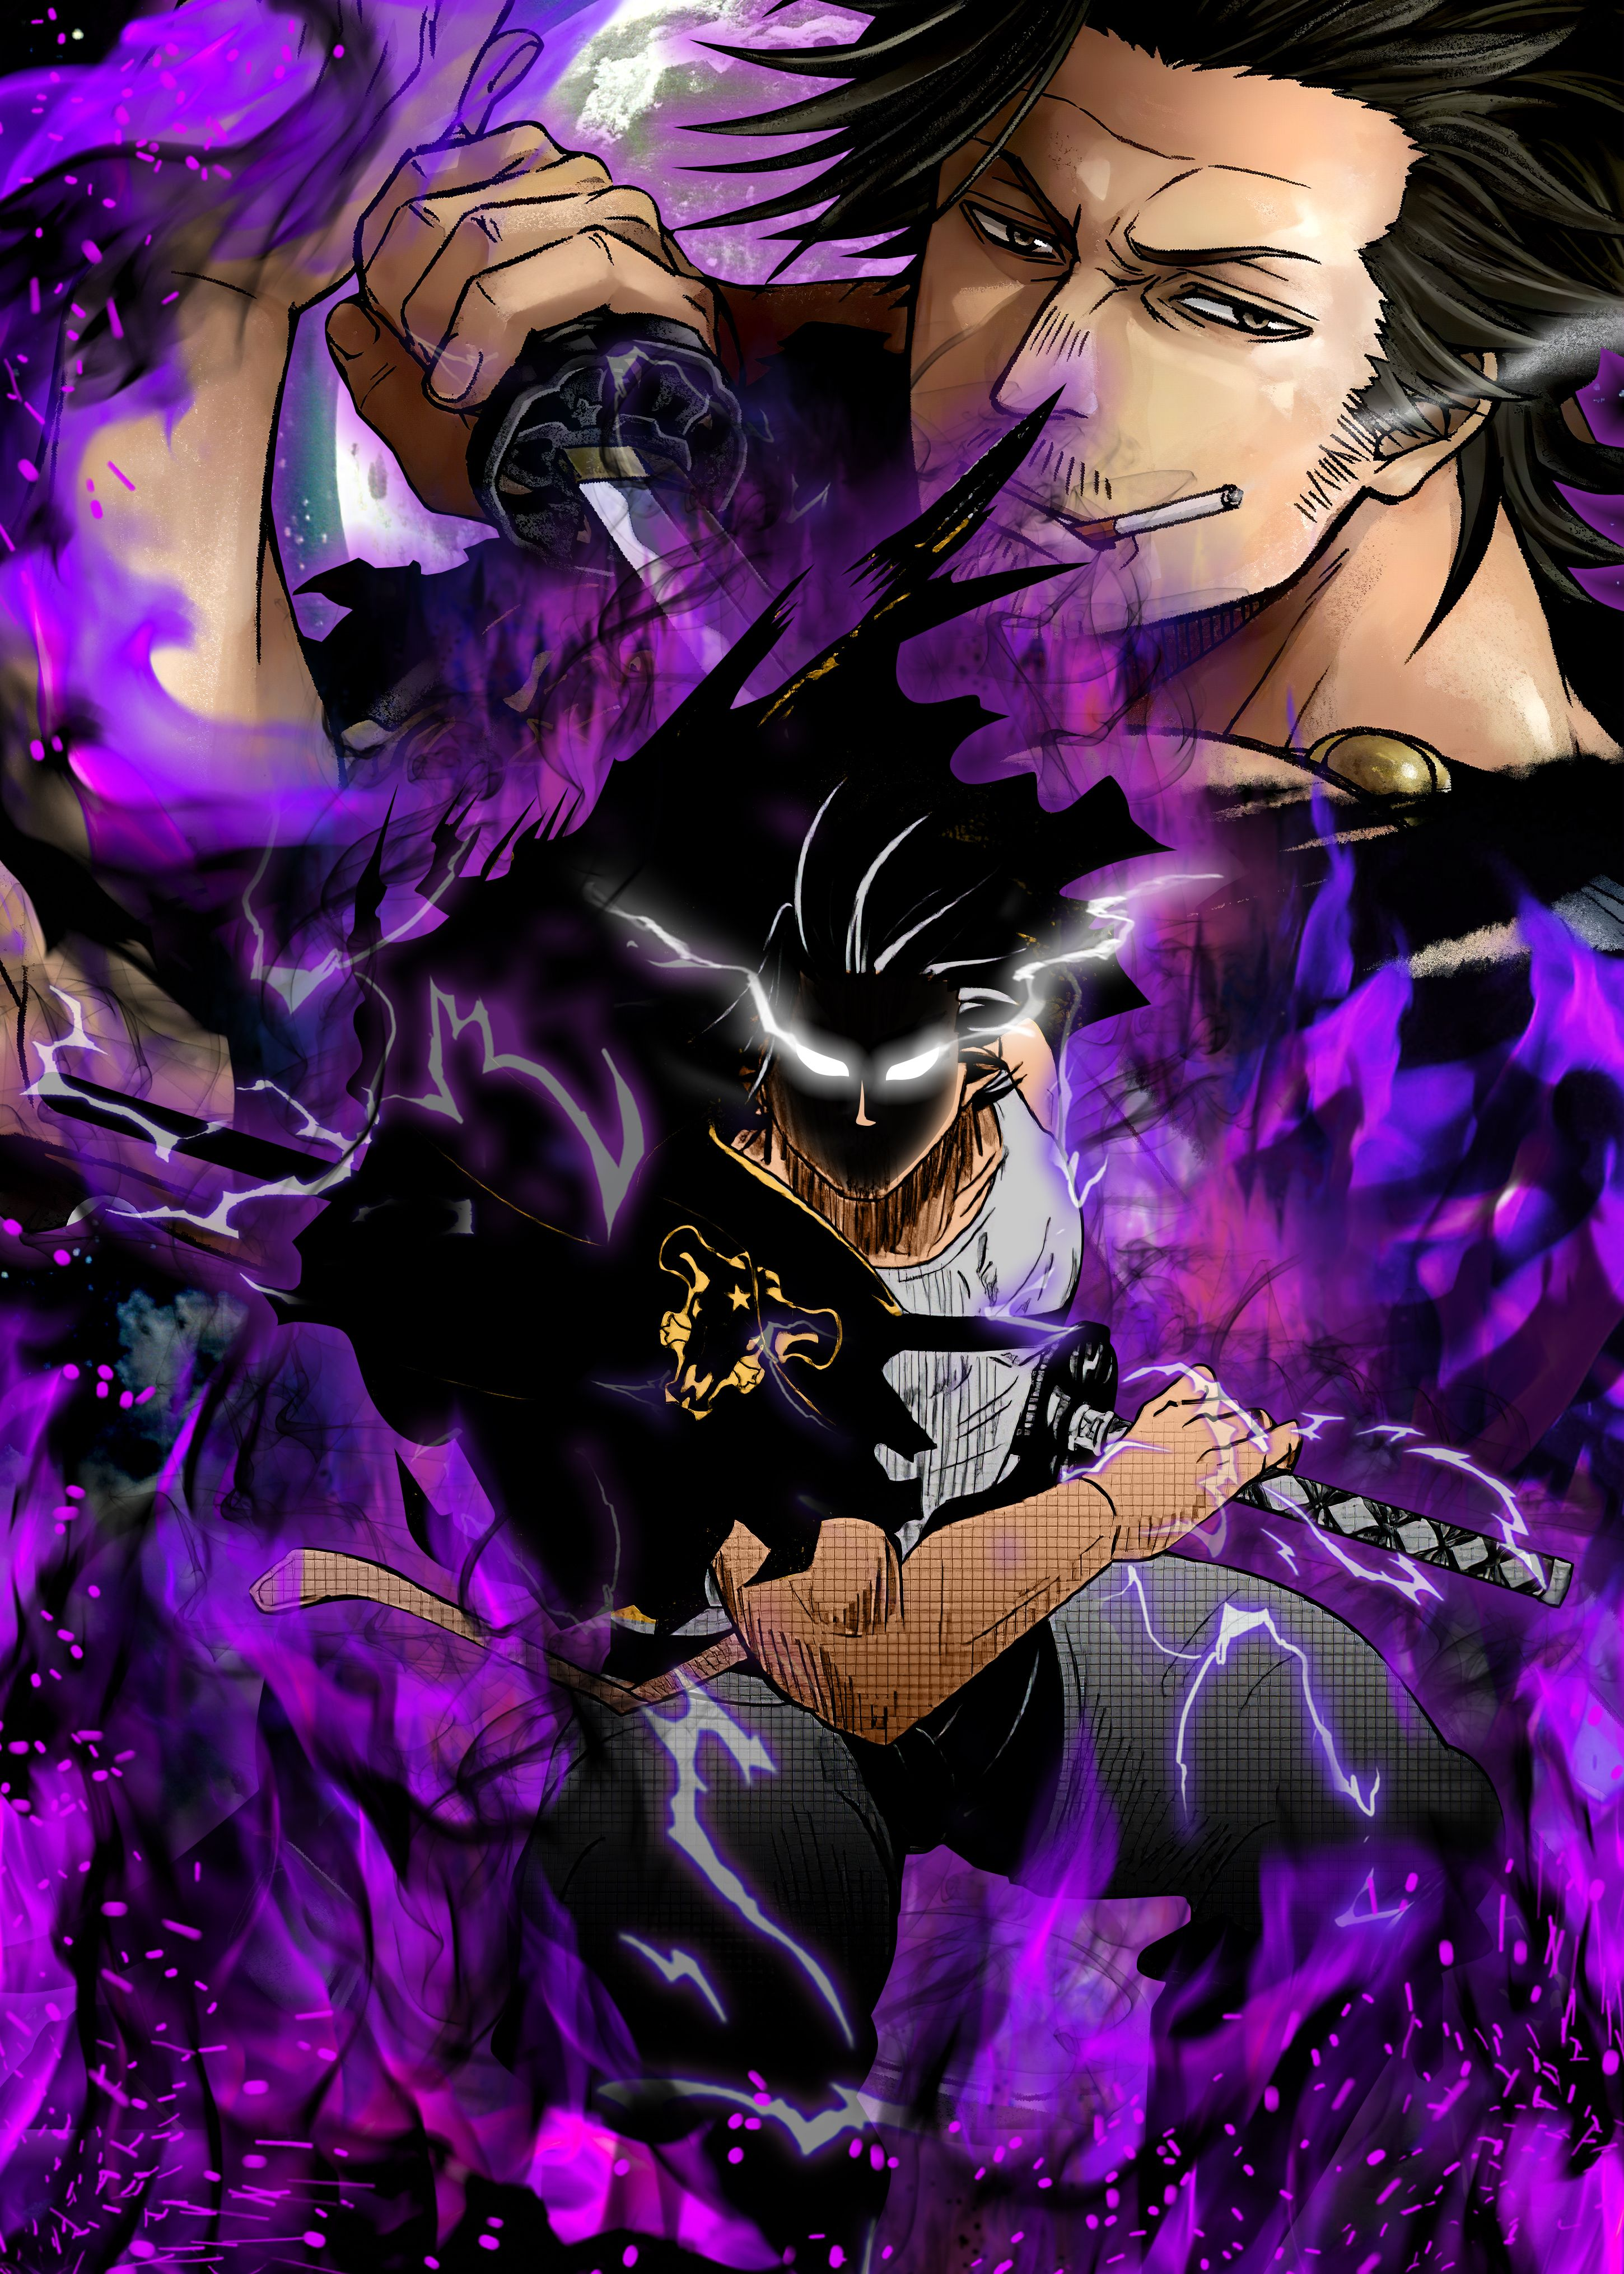 86 Yami Sukehiro Ideas In 2021 Black Clover Anime Clover Black Clover Manga